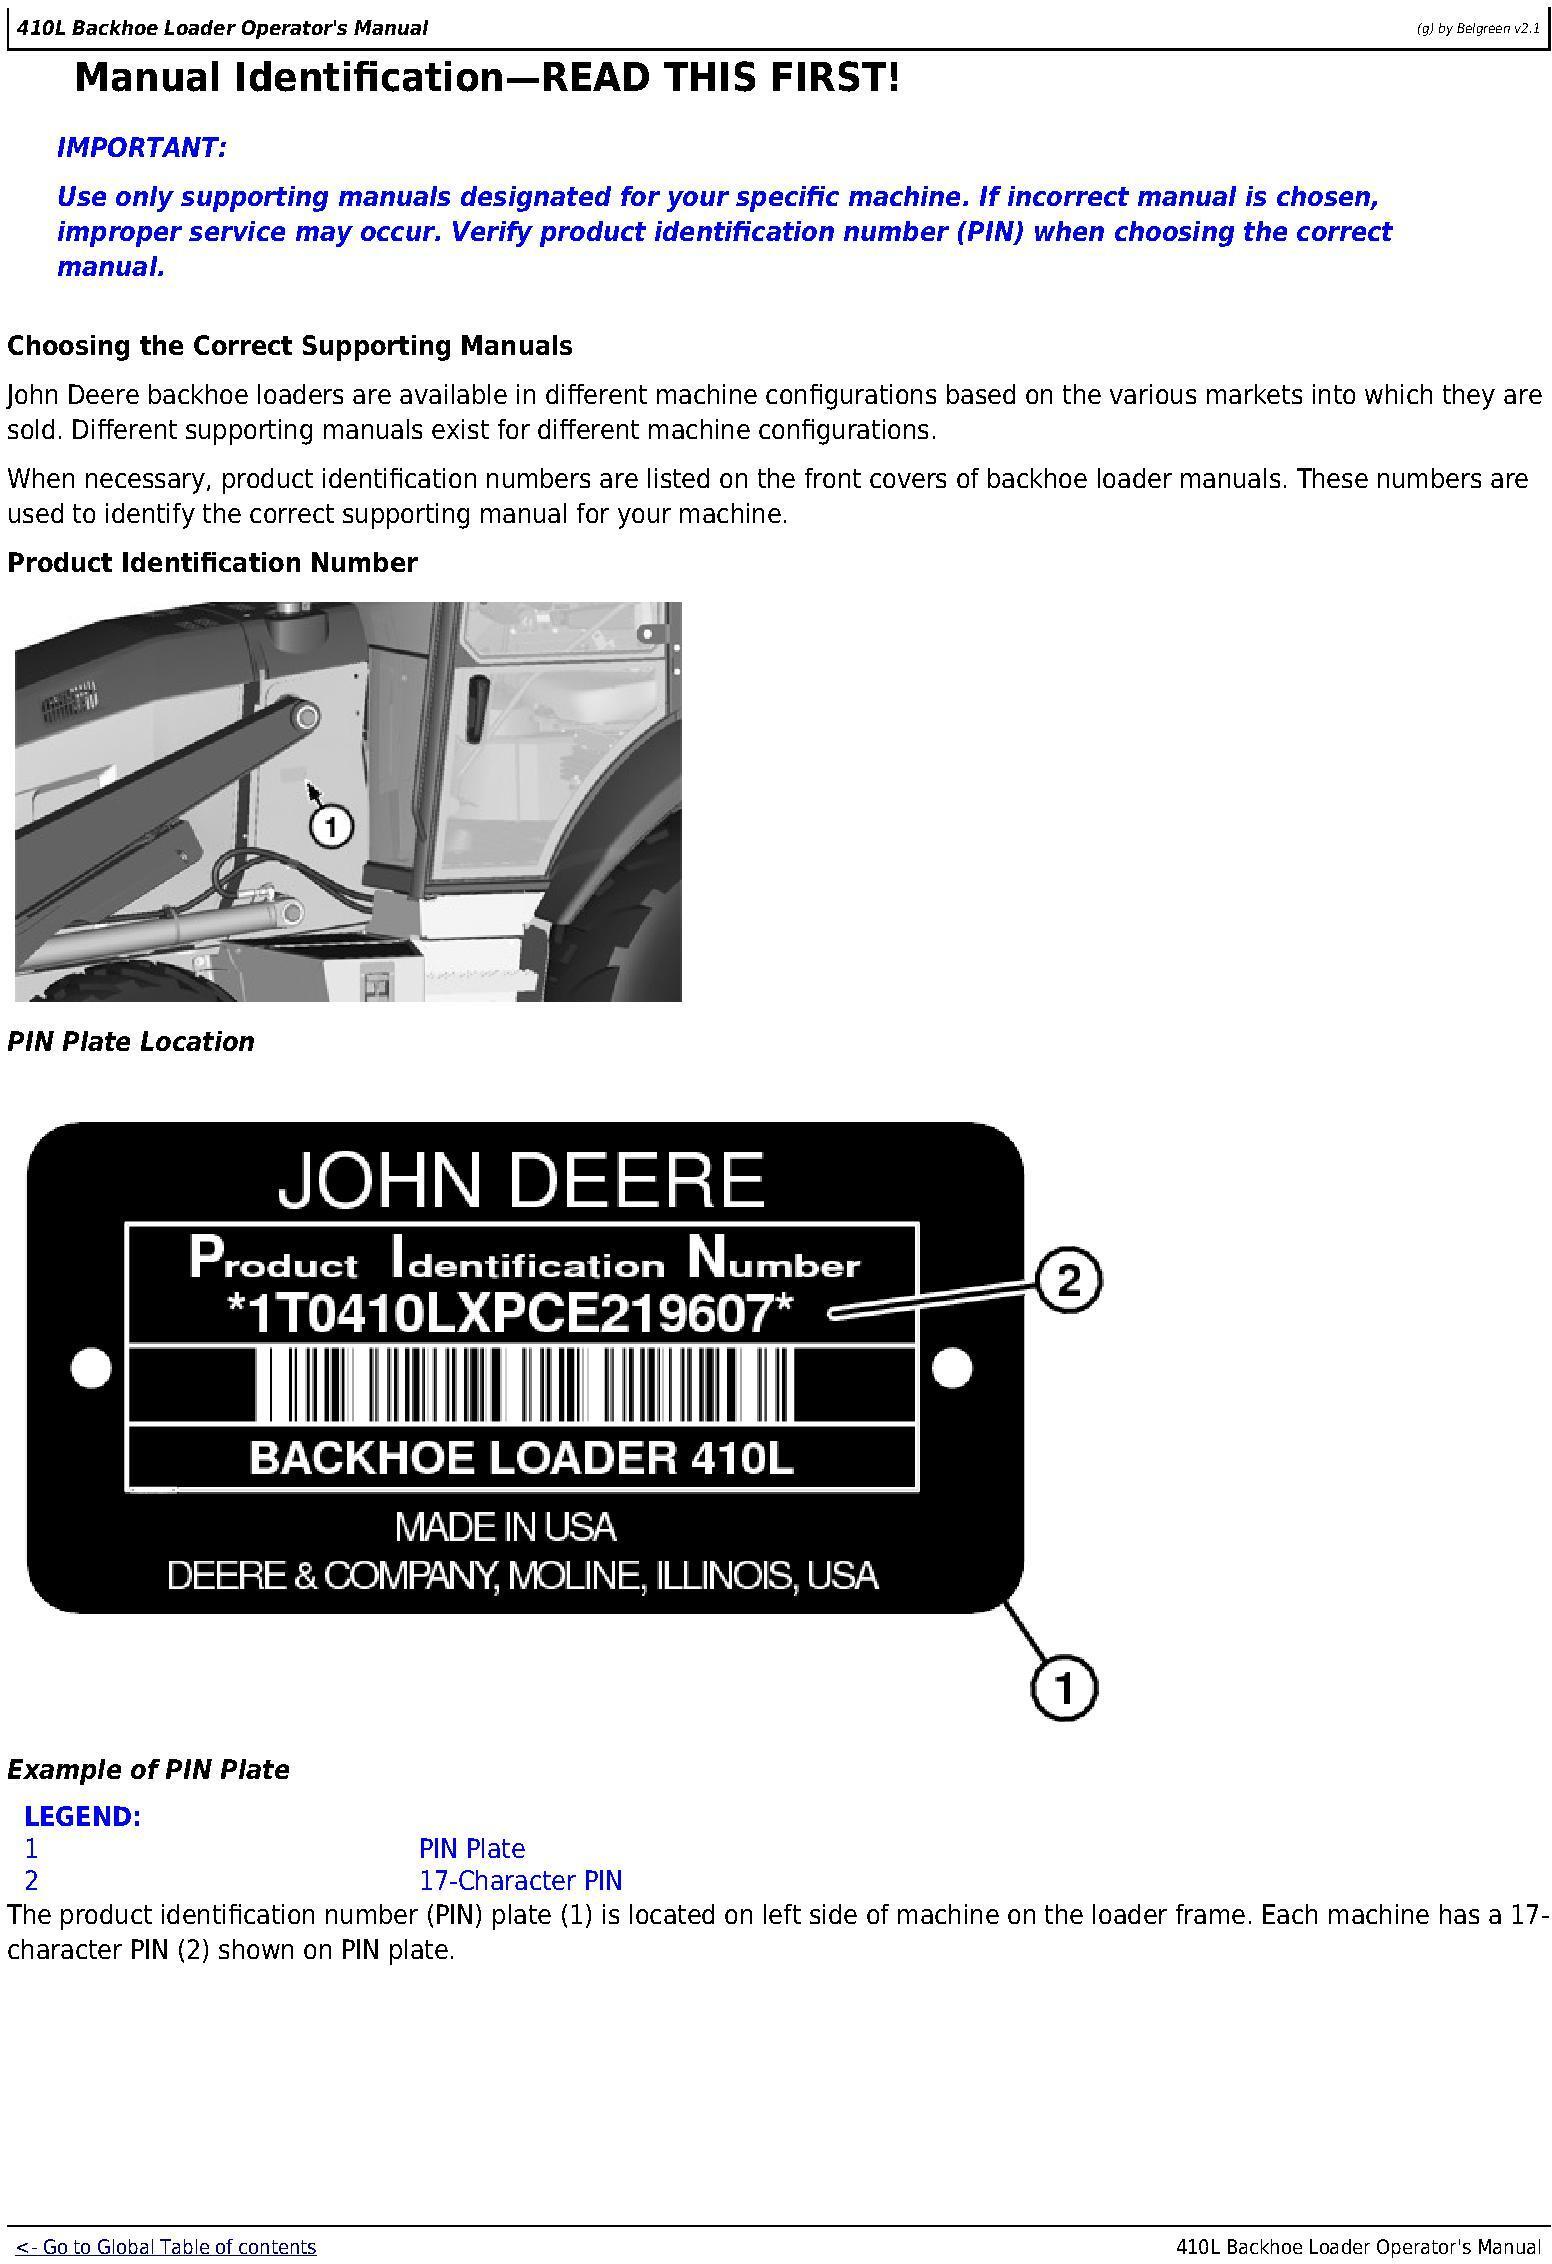 OMT357556X19 - JD John Deere 410L Backhoe Loader Operators Manual (sn. C273920-; D273920-) - 1